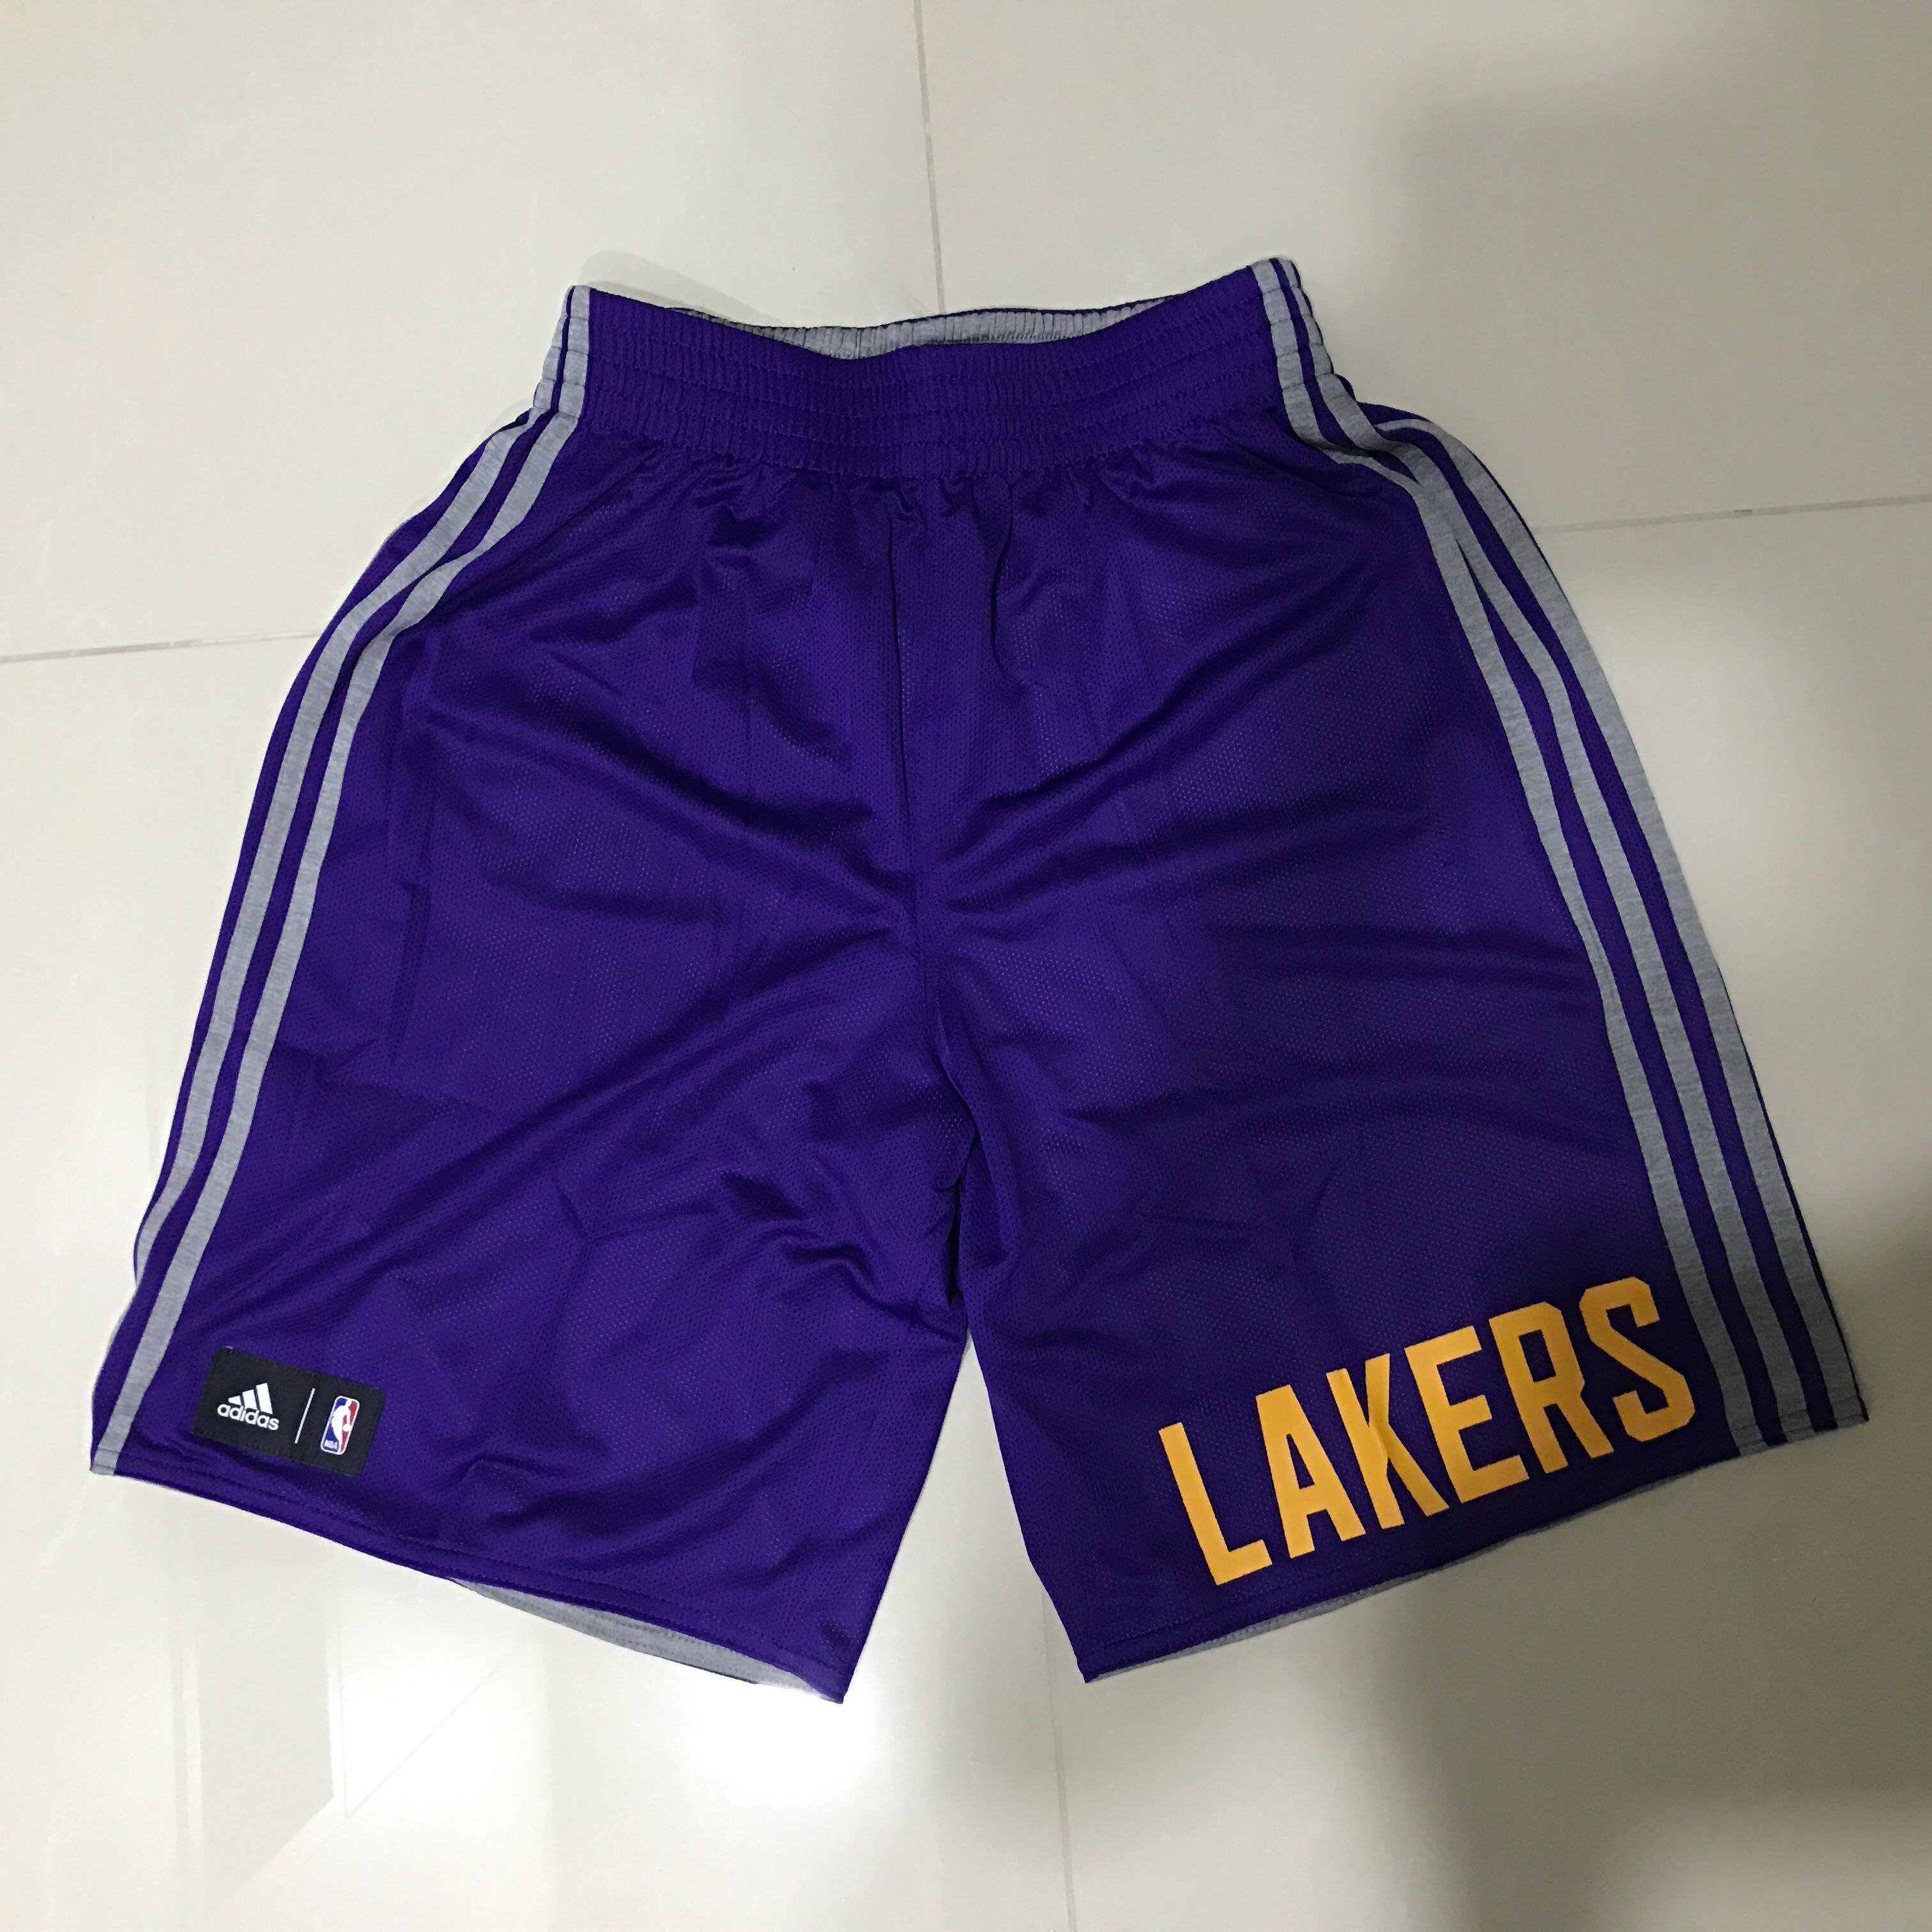 Authentic BN Adidas NBA LA Lakers Reversible Basketball Shorts Size ... 2fa3bfa7c